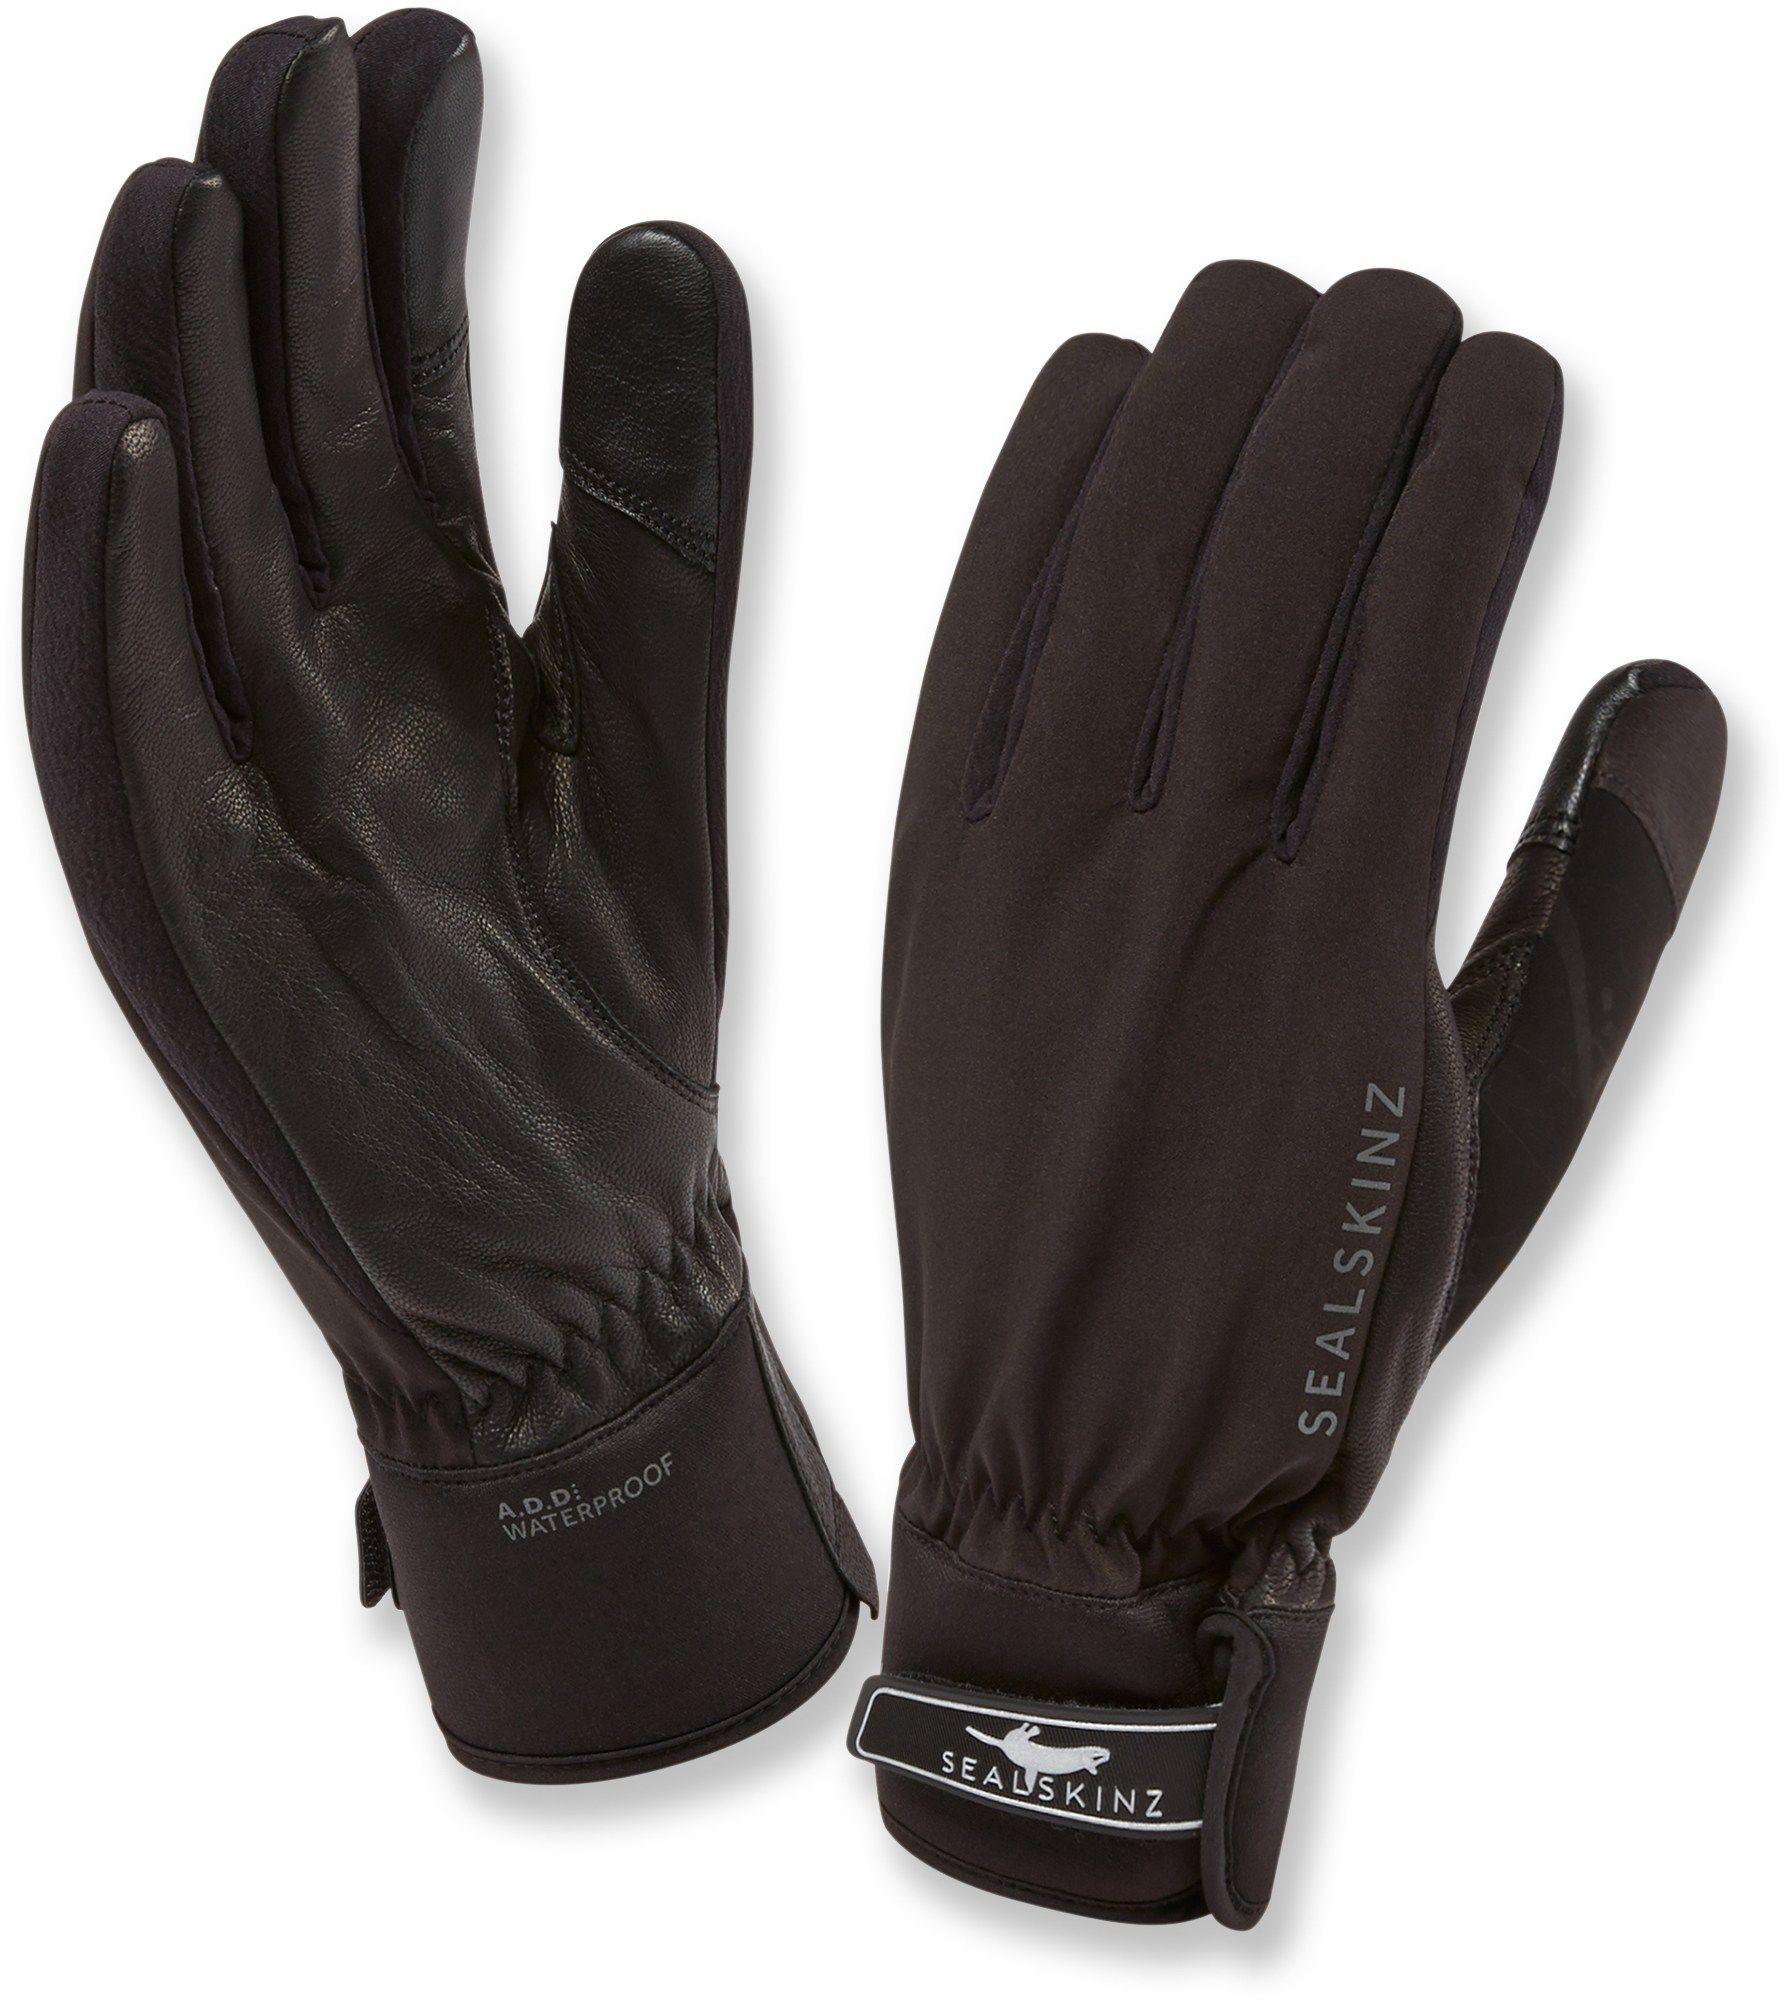 SealSkinz All-Season Tech-Compatible Shell Gloves